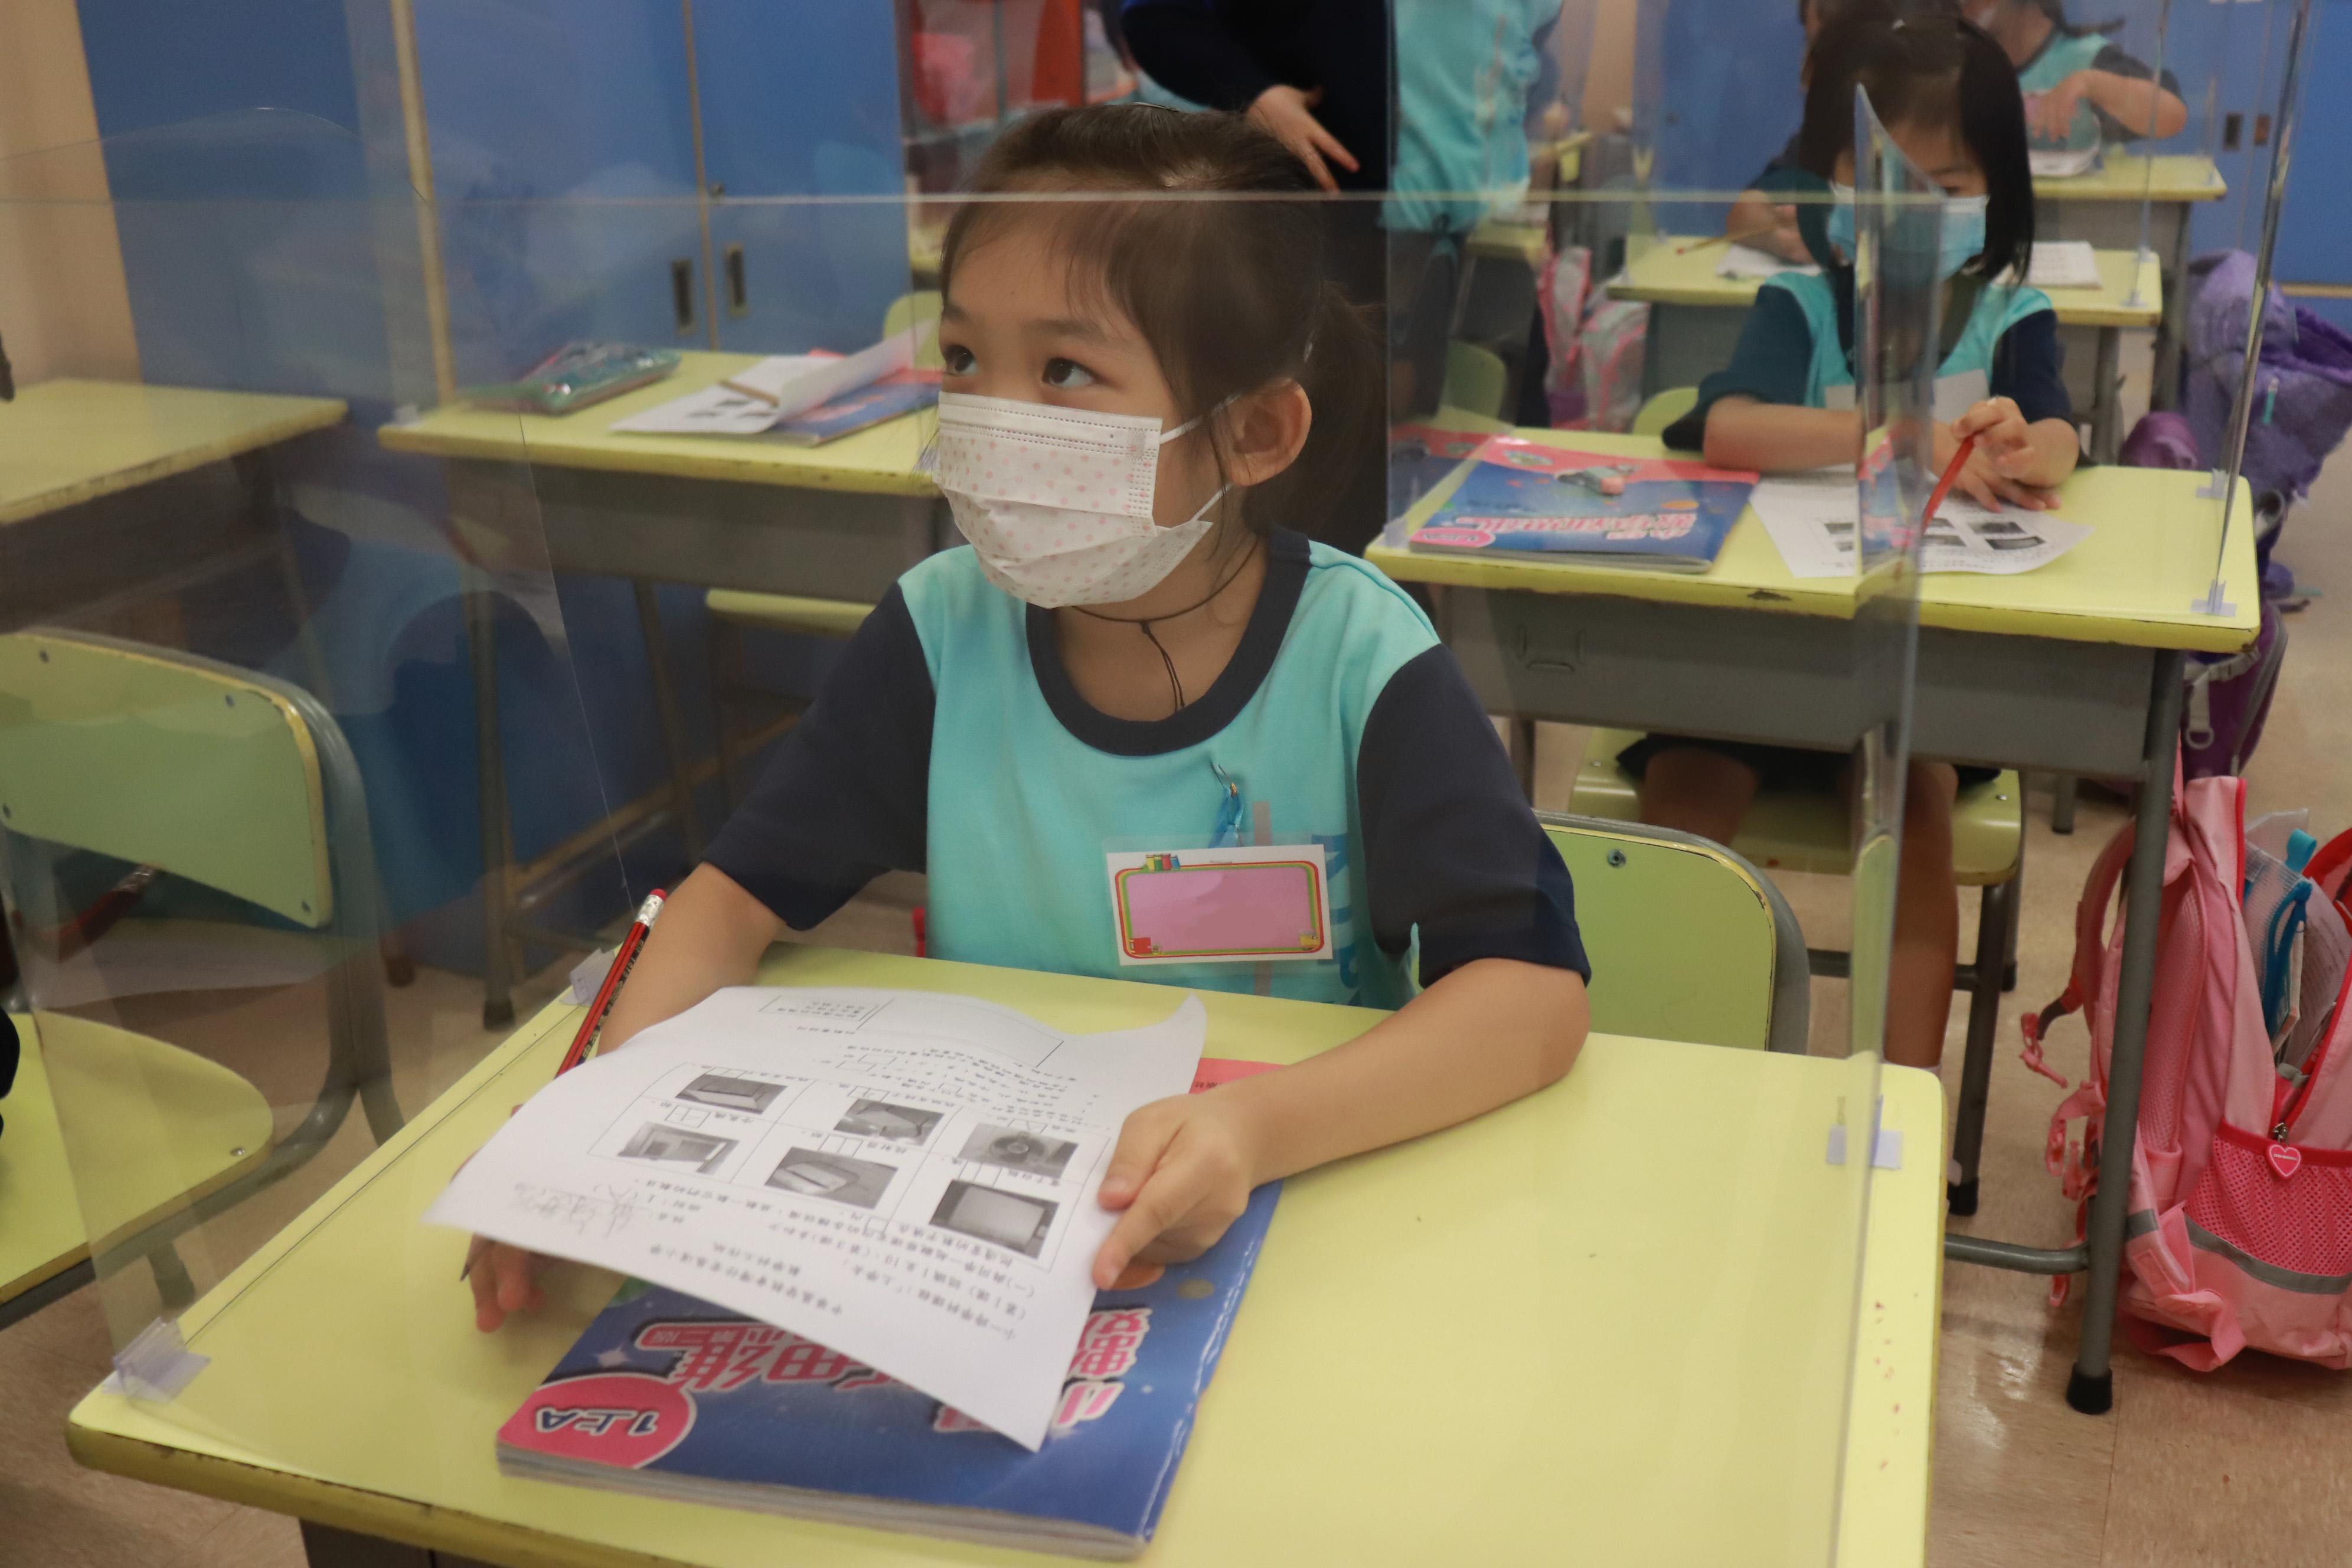 http://keito.school.hk/sites/default/files/img_6165_1.jpg